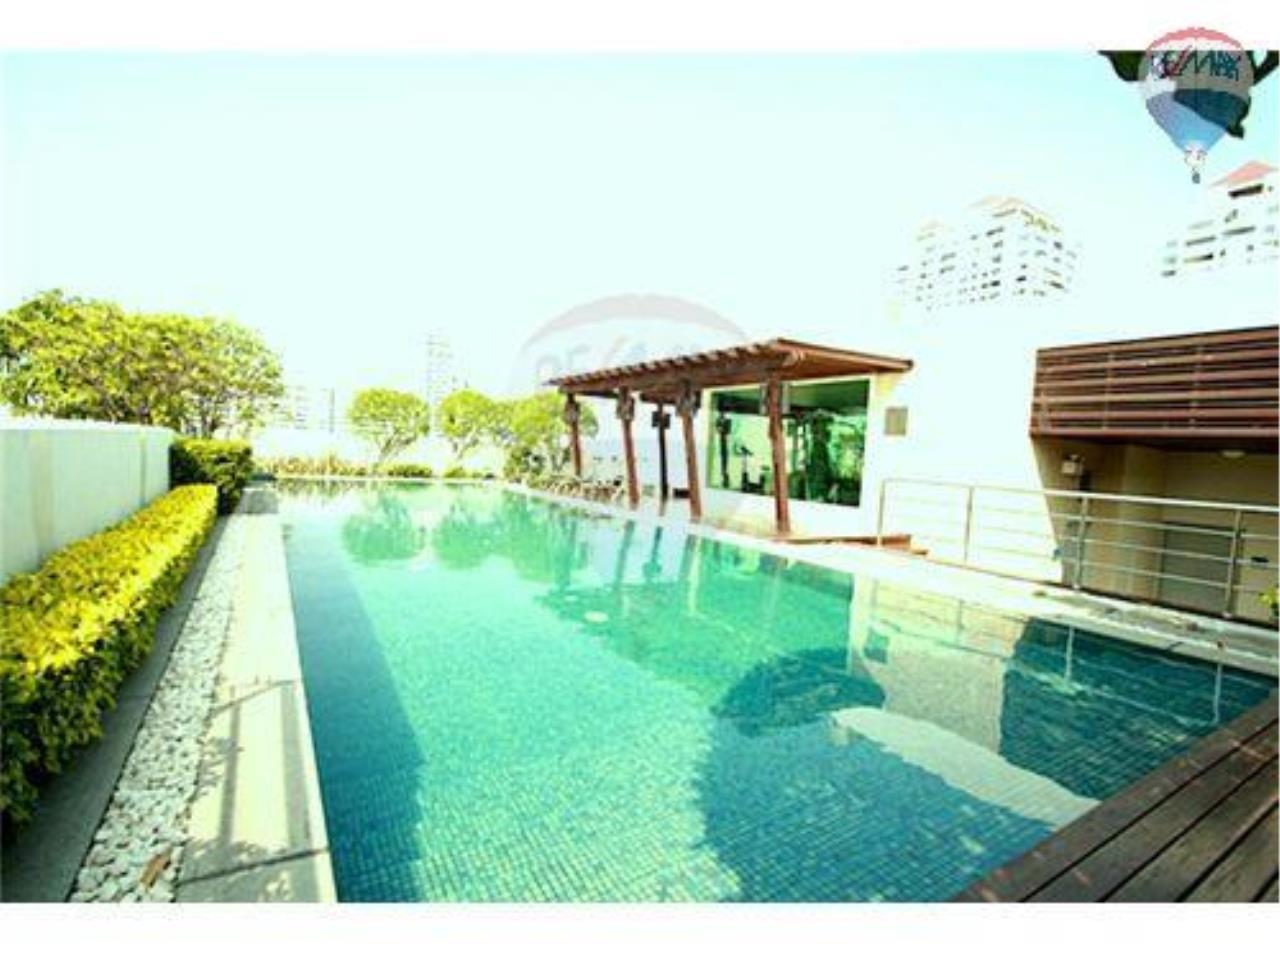 RE/MAX Properties Agency's 2 Bedroom Apartment- Sukhumvit Soi 49 14